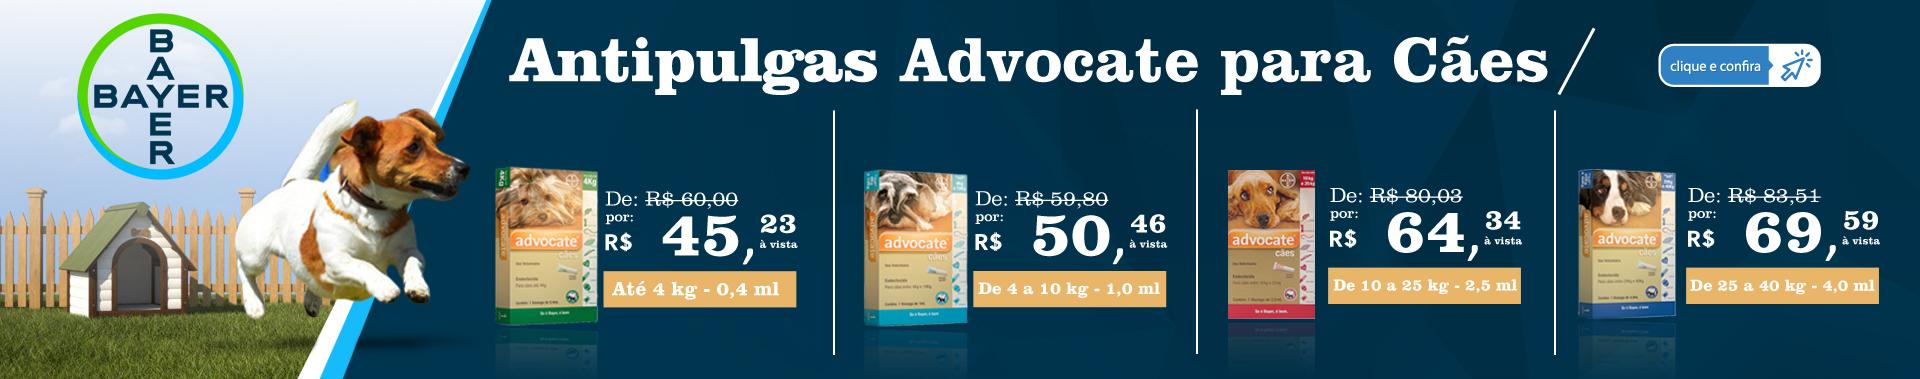 Antipulgas Advocate para Cães